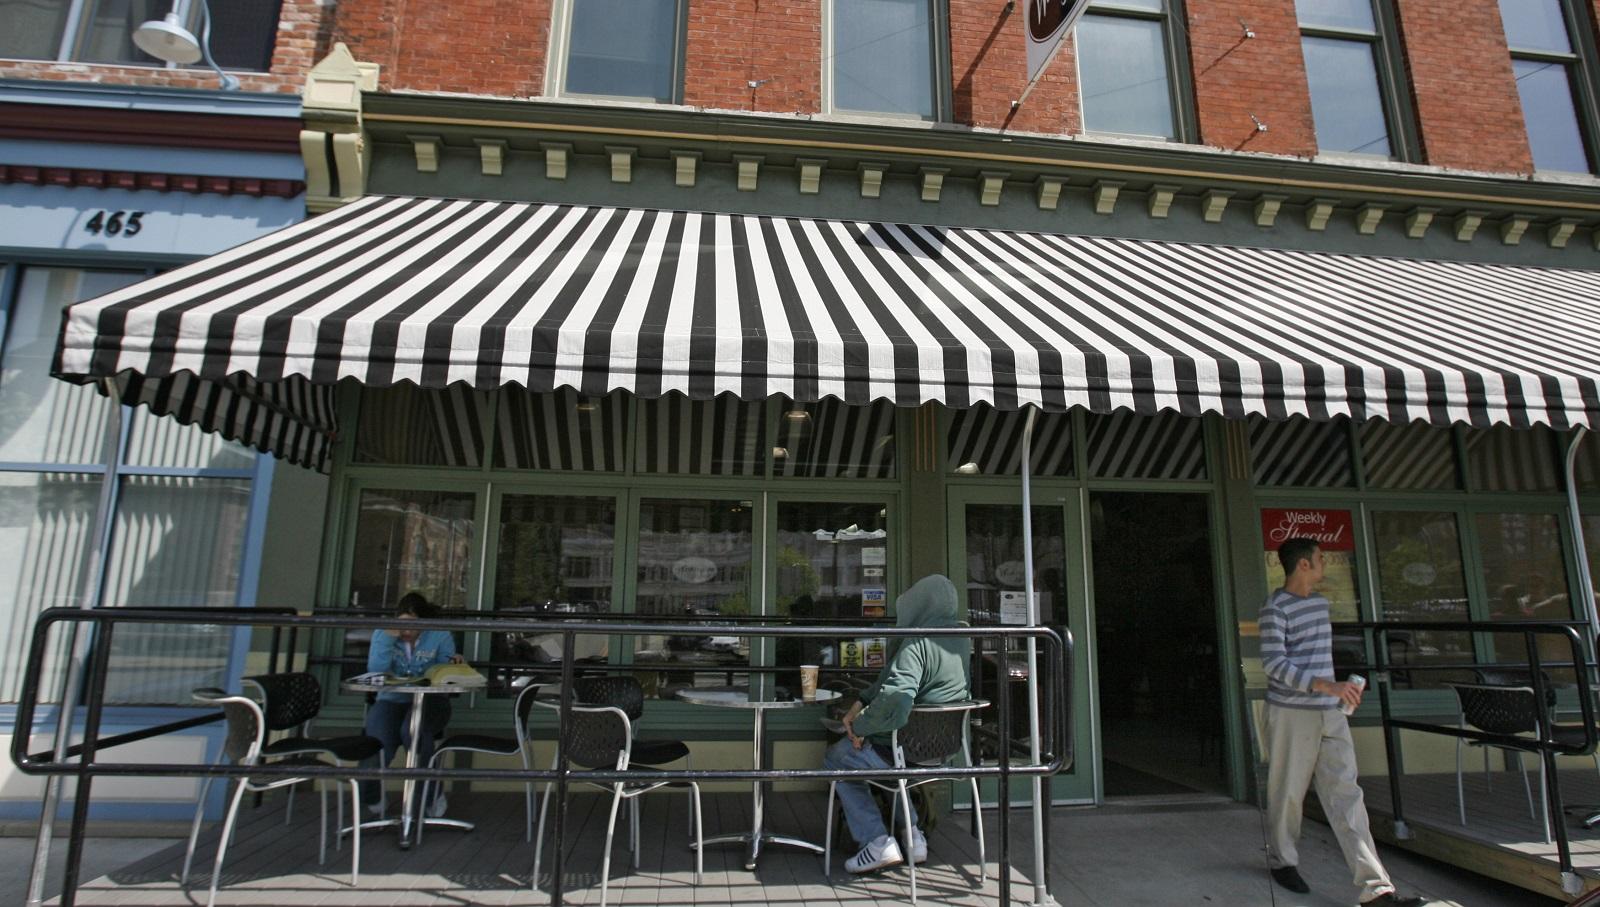 The Washington Market on Ellicott Street is for sale. (Derek Gee/Buffalo News file photo)